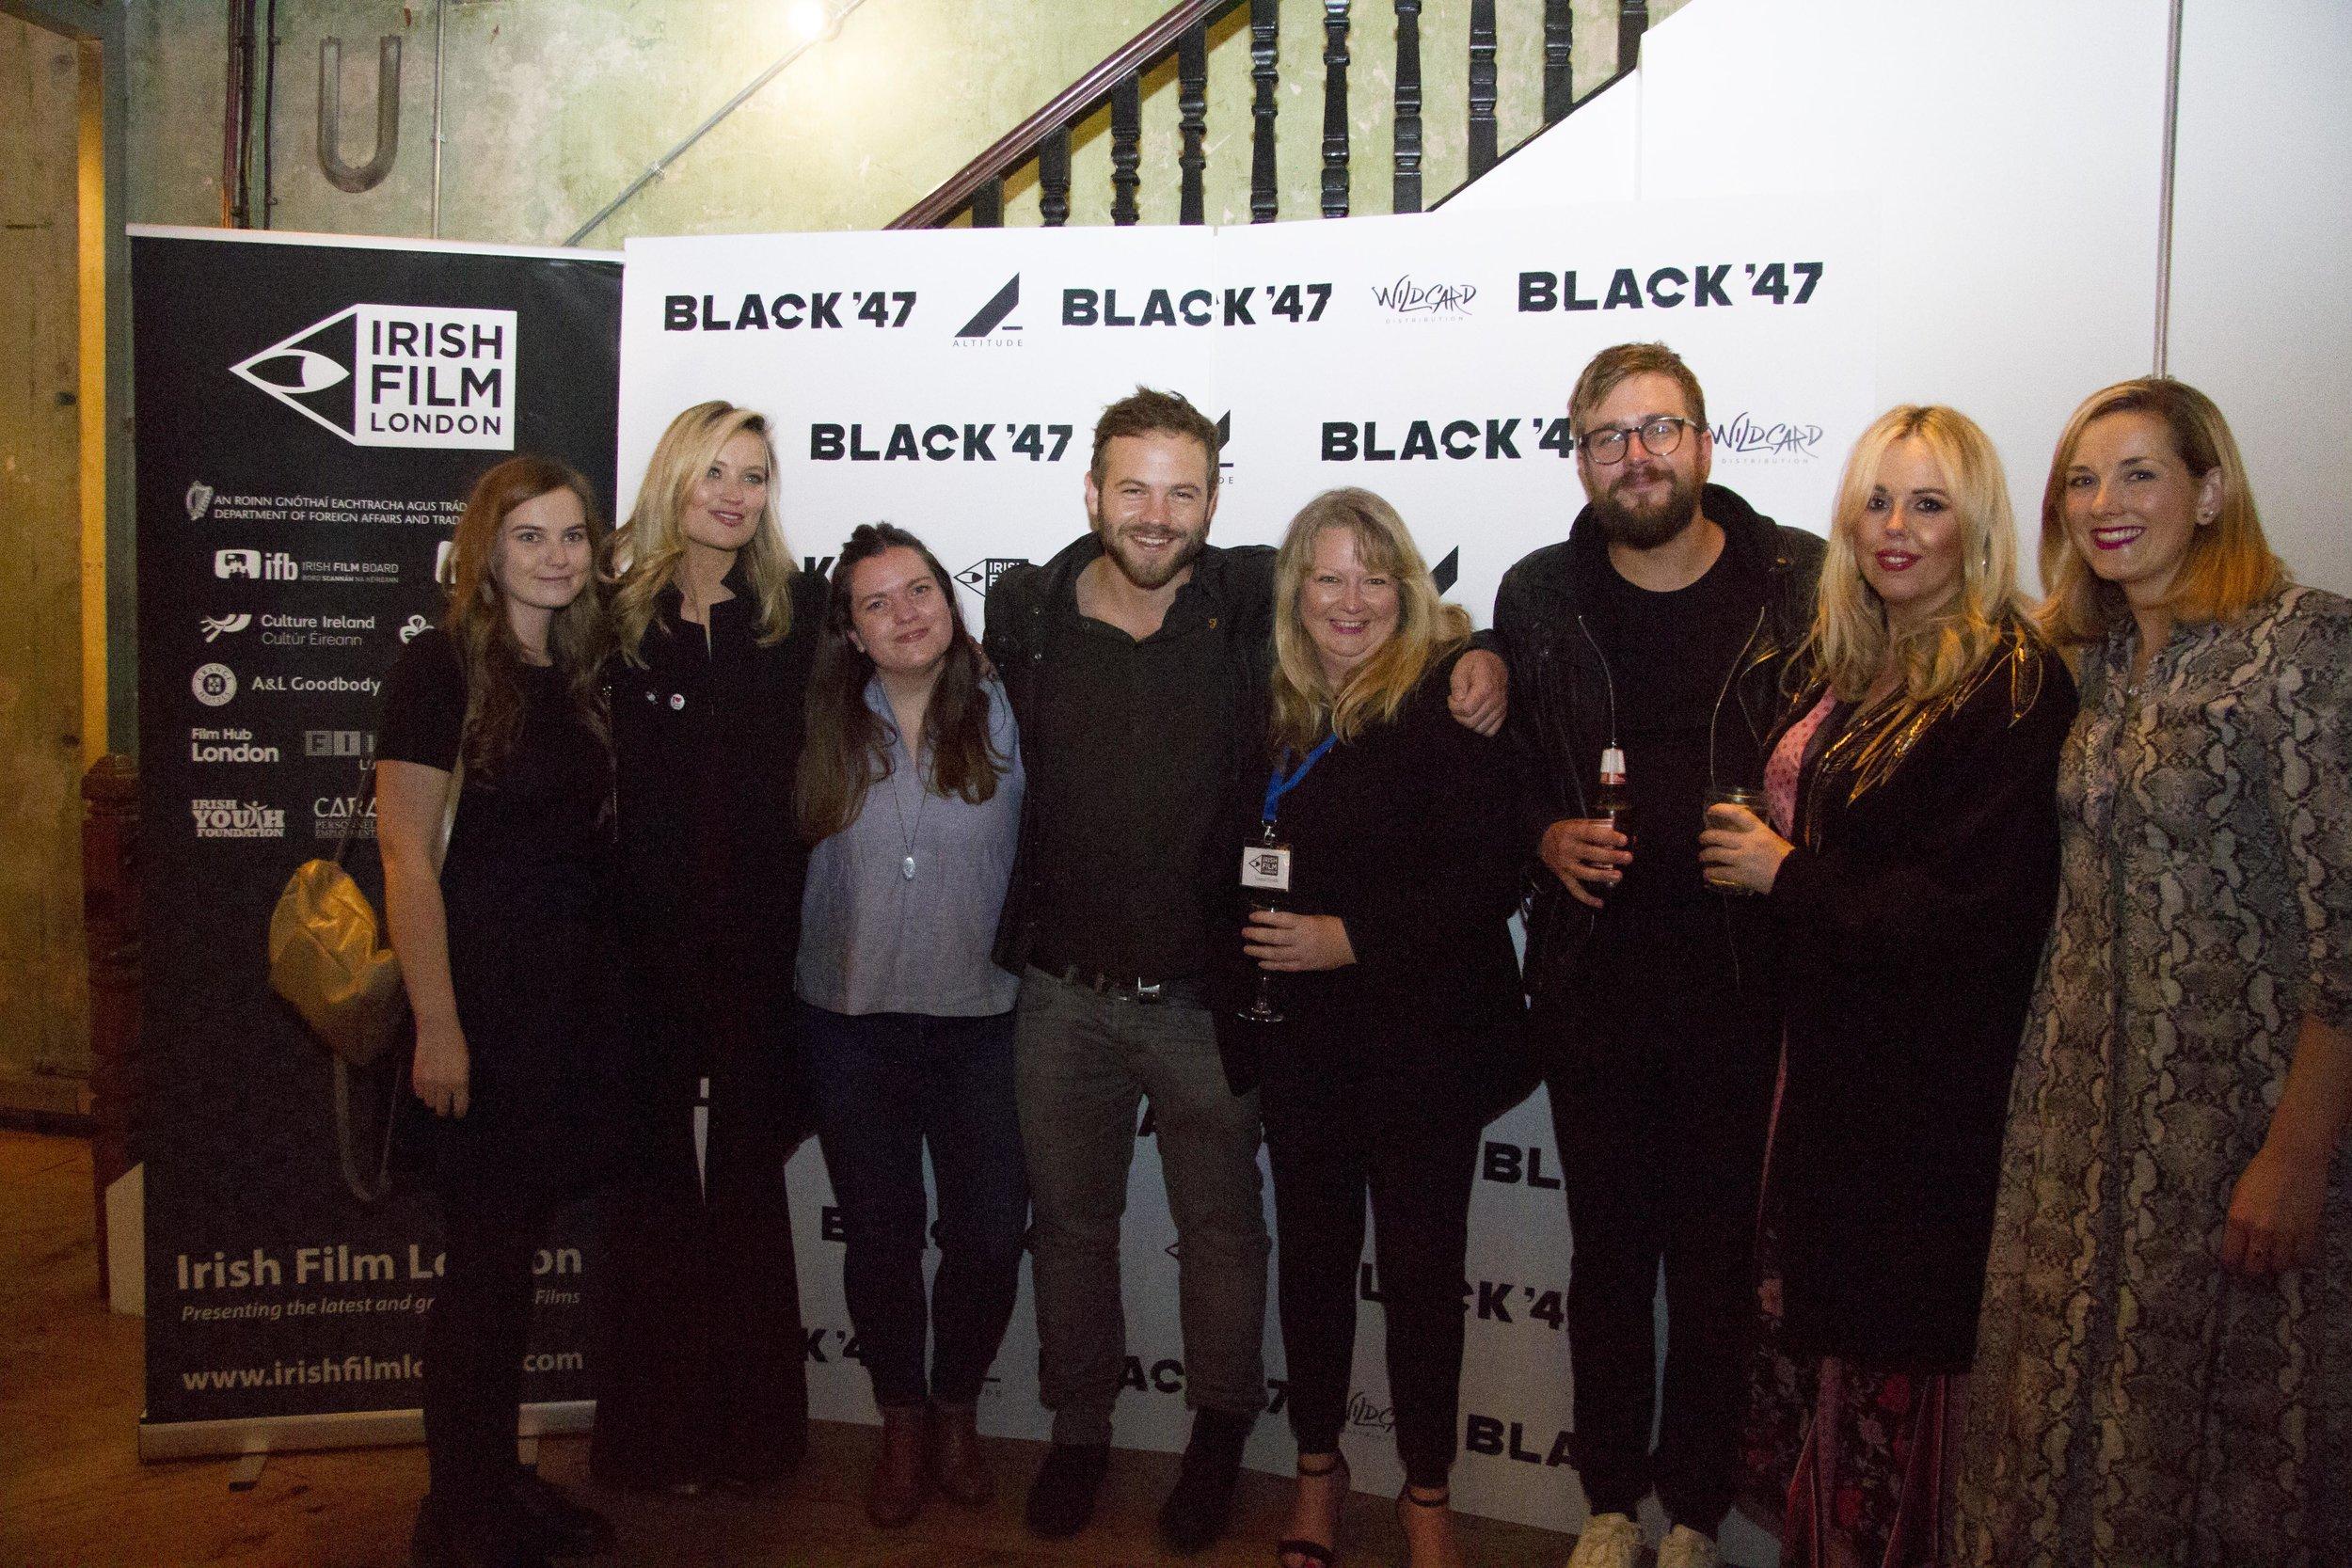 Black 47 London Premiere 2018 Photos courtesy of Noel Mullen Irish Film London 66 Eimear Keenan Laura Whitmore Sile Culley Moe Dunford Sinead Smith Iain Stirling Roisin Conaty and Suzie Houlihan.jpg